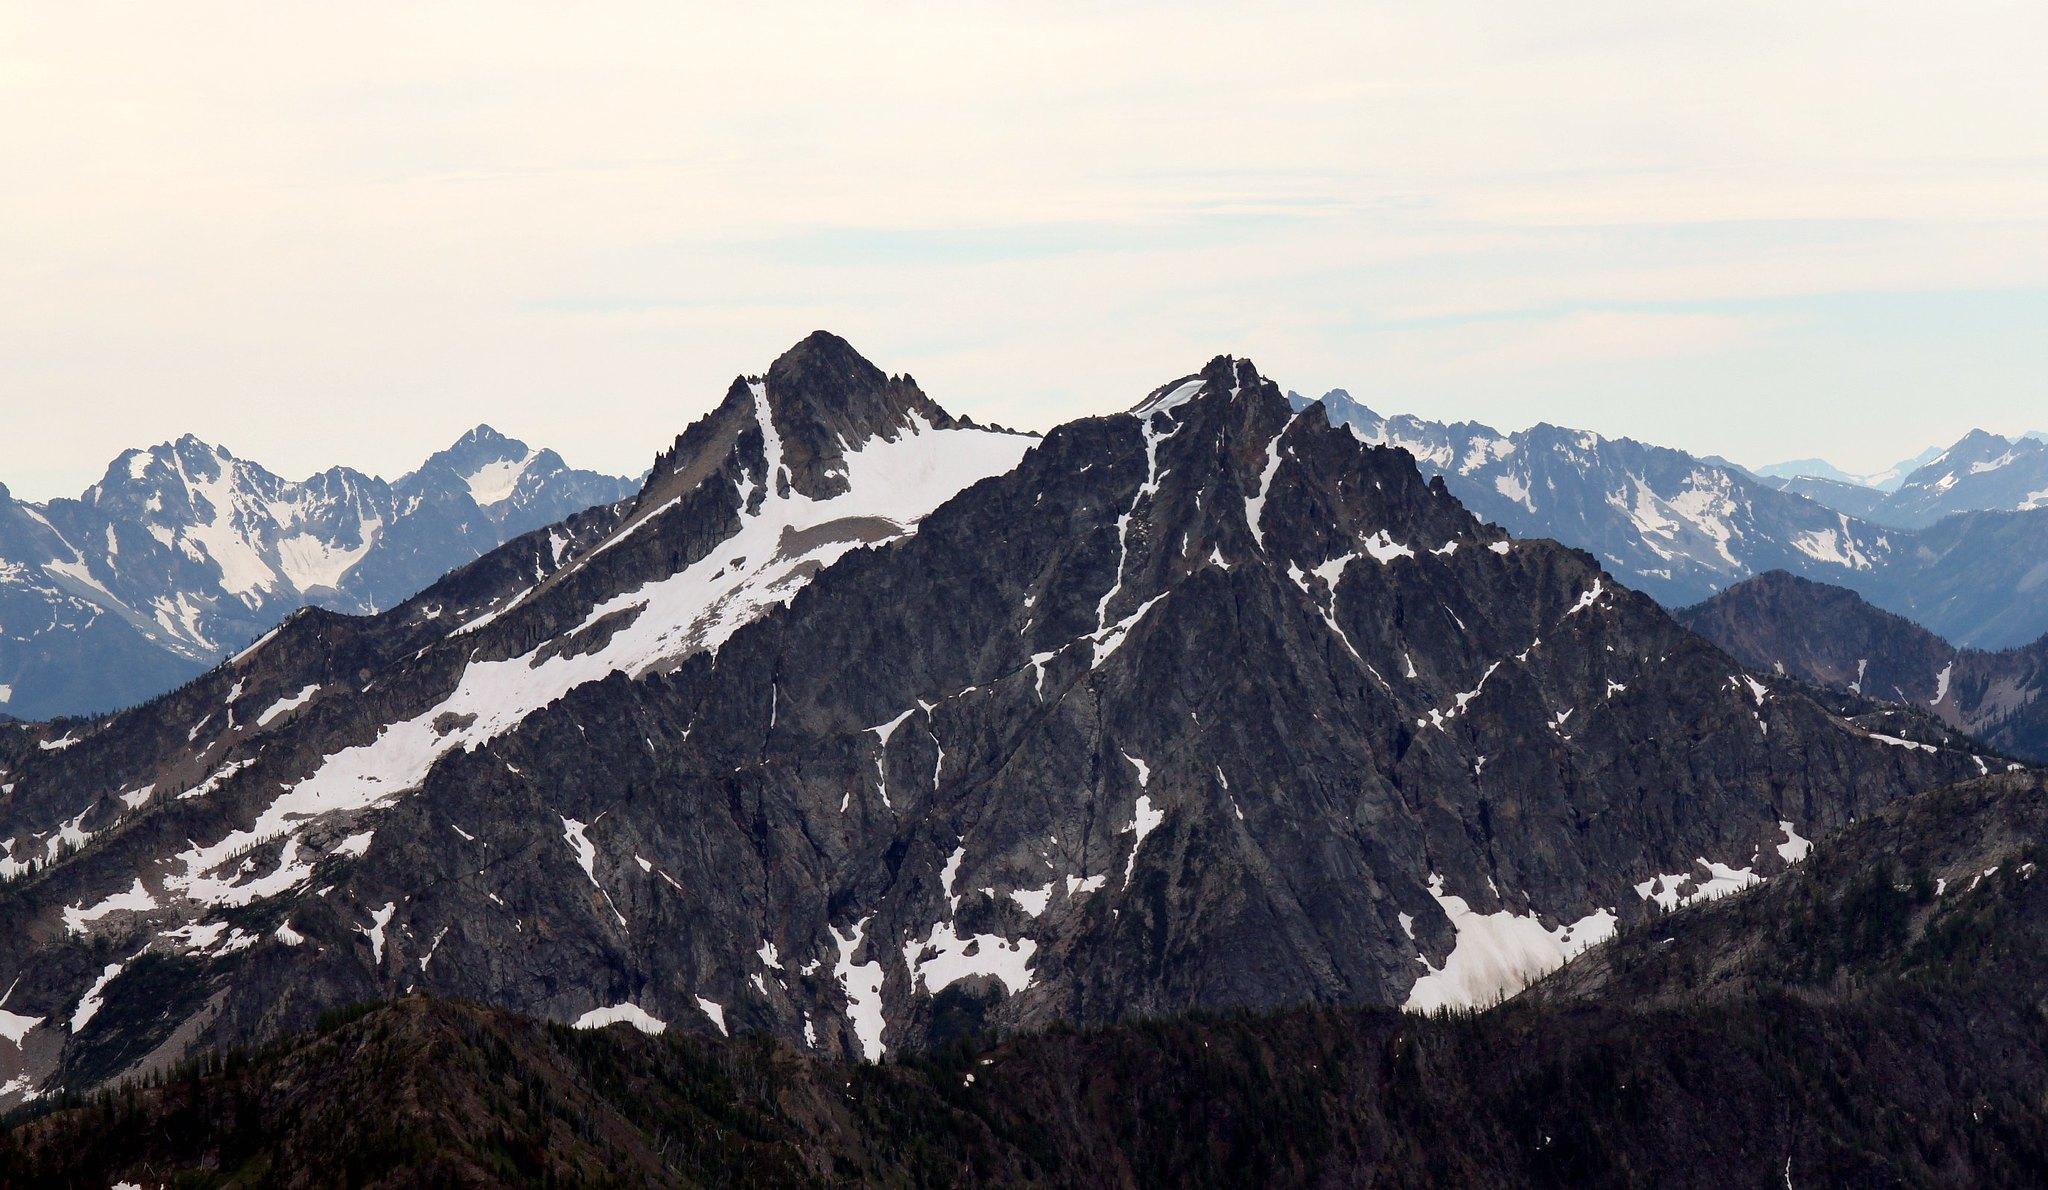 Reynolds Peak of Twisp Slam